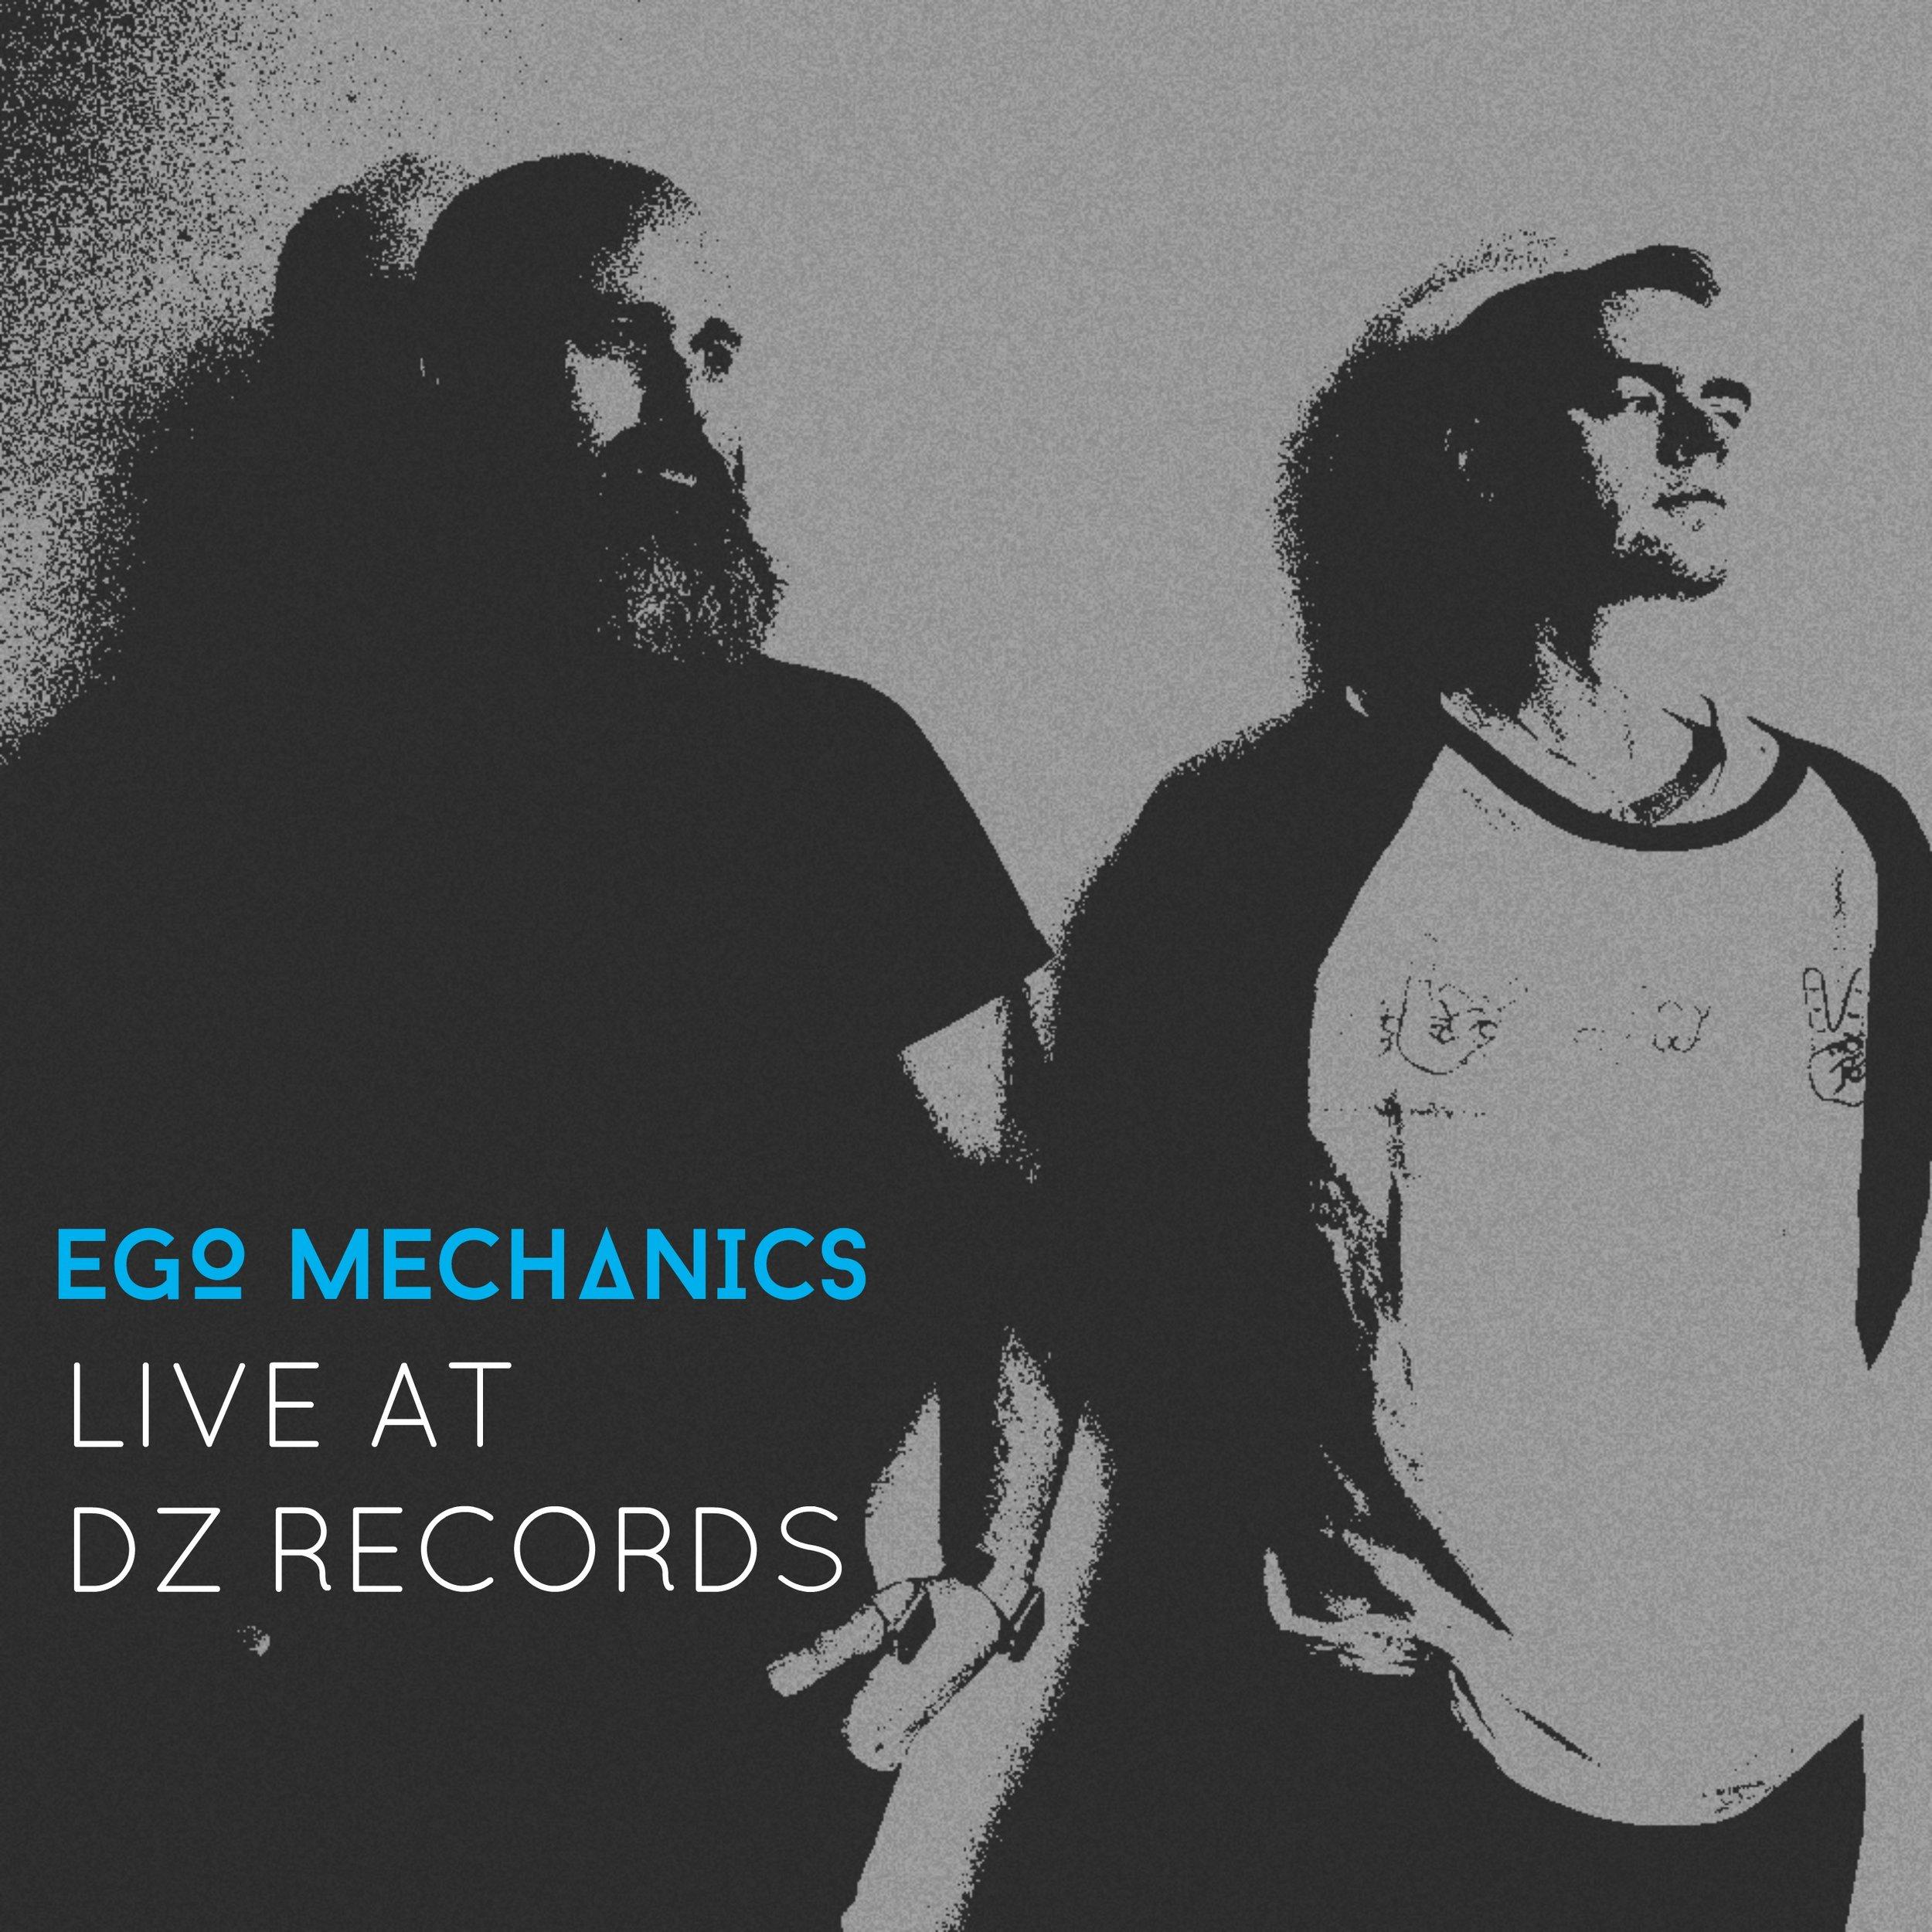 dz record cover.jpg